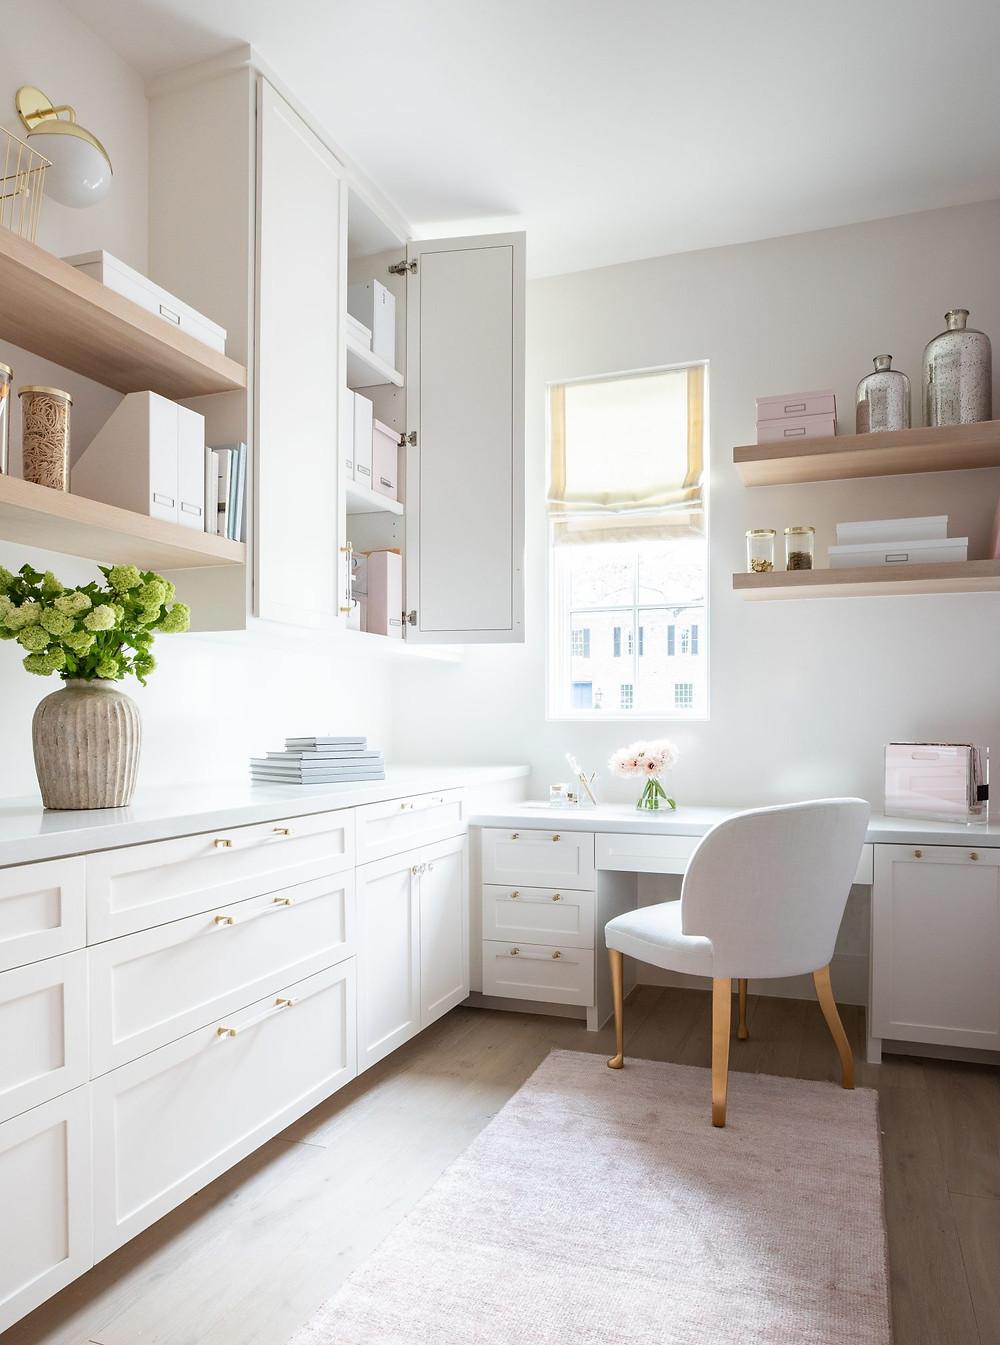 Homefulness - Organised home office